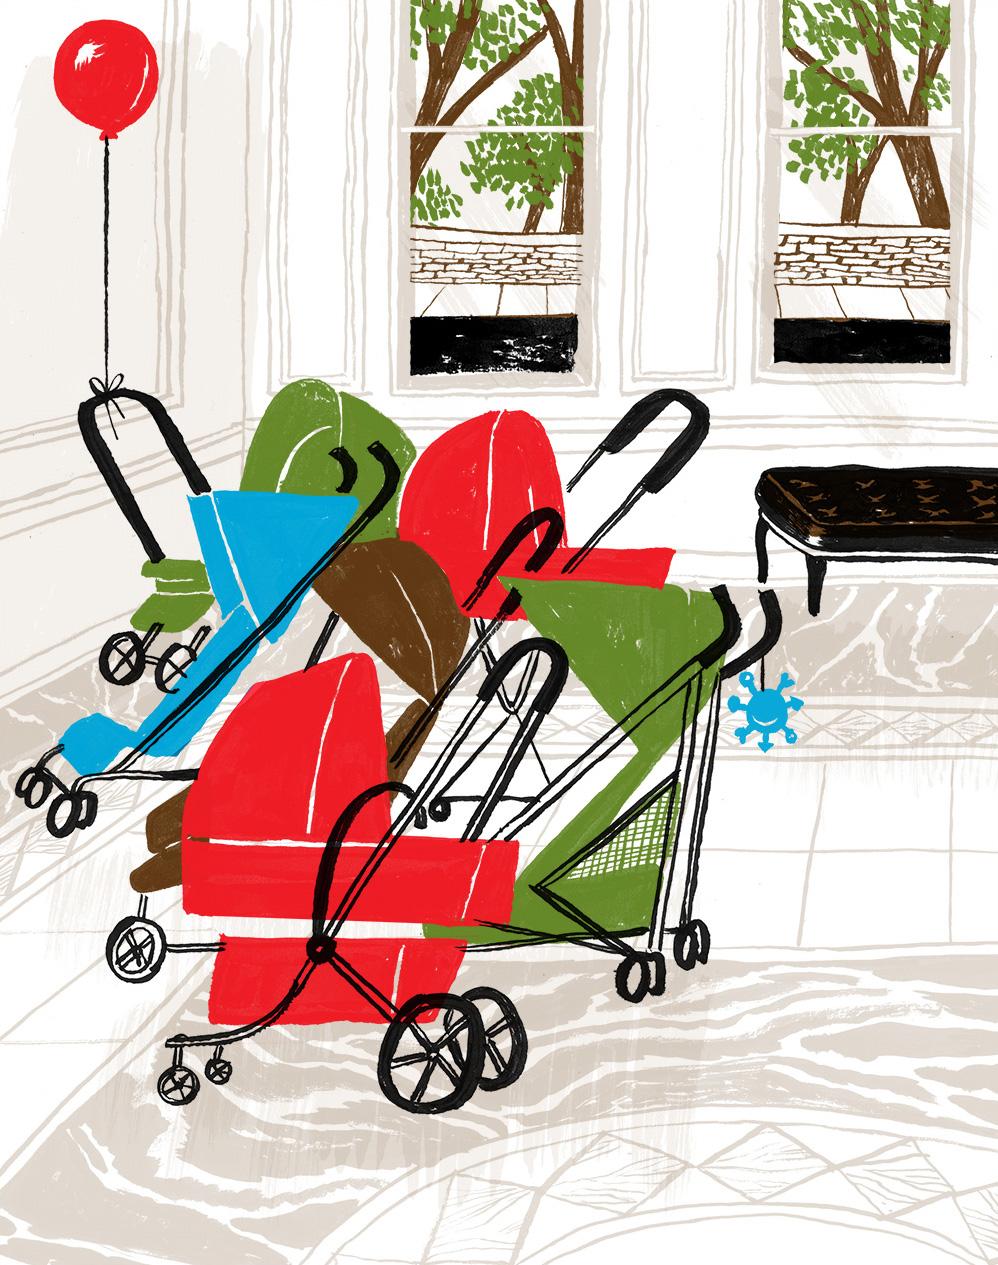 stroller_lobby_crop.jpg